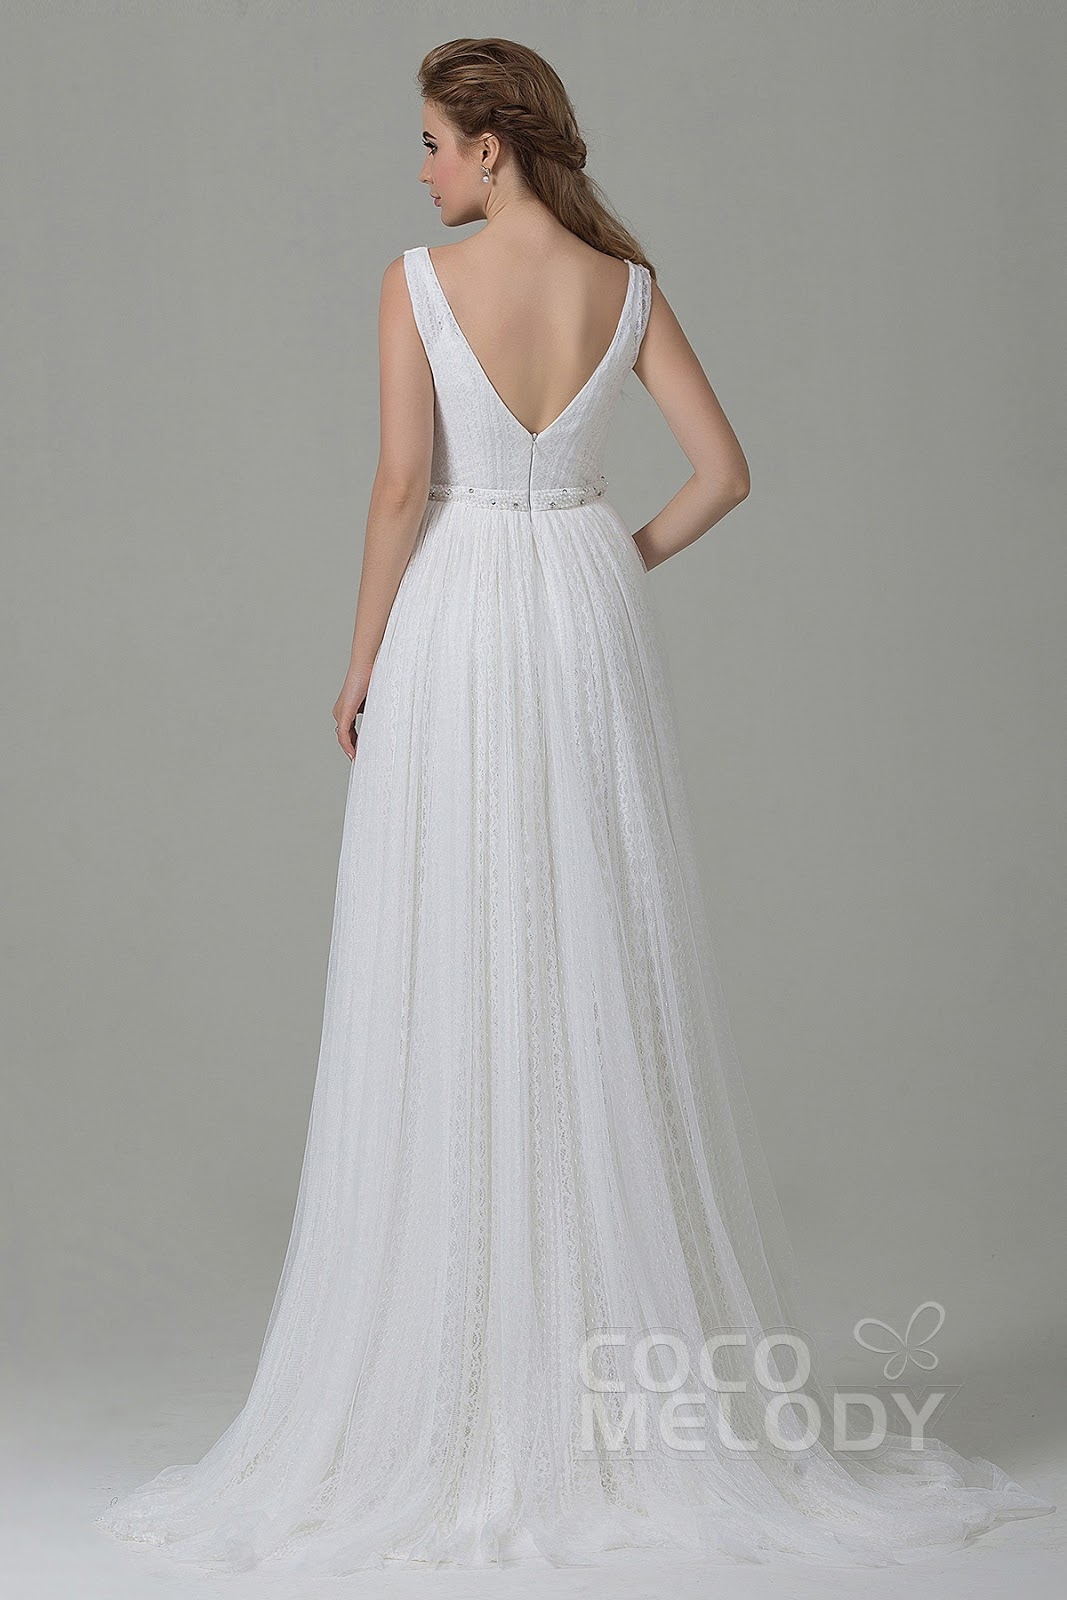 luckypanda dream wedding dresses